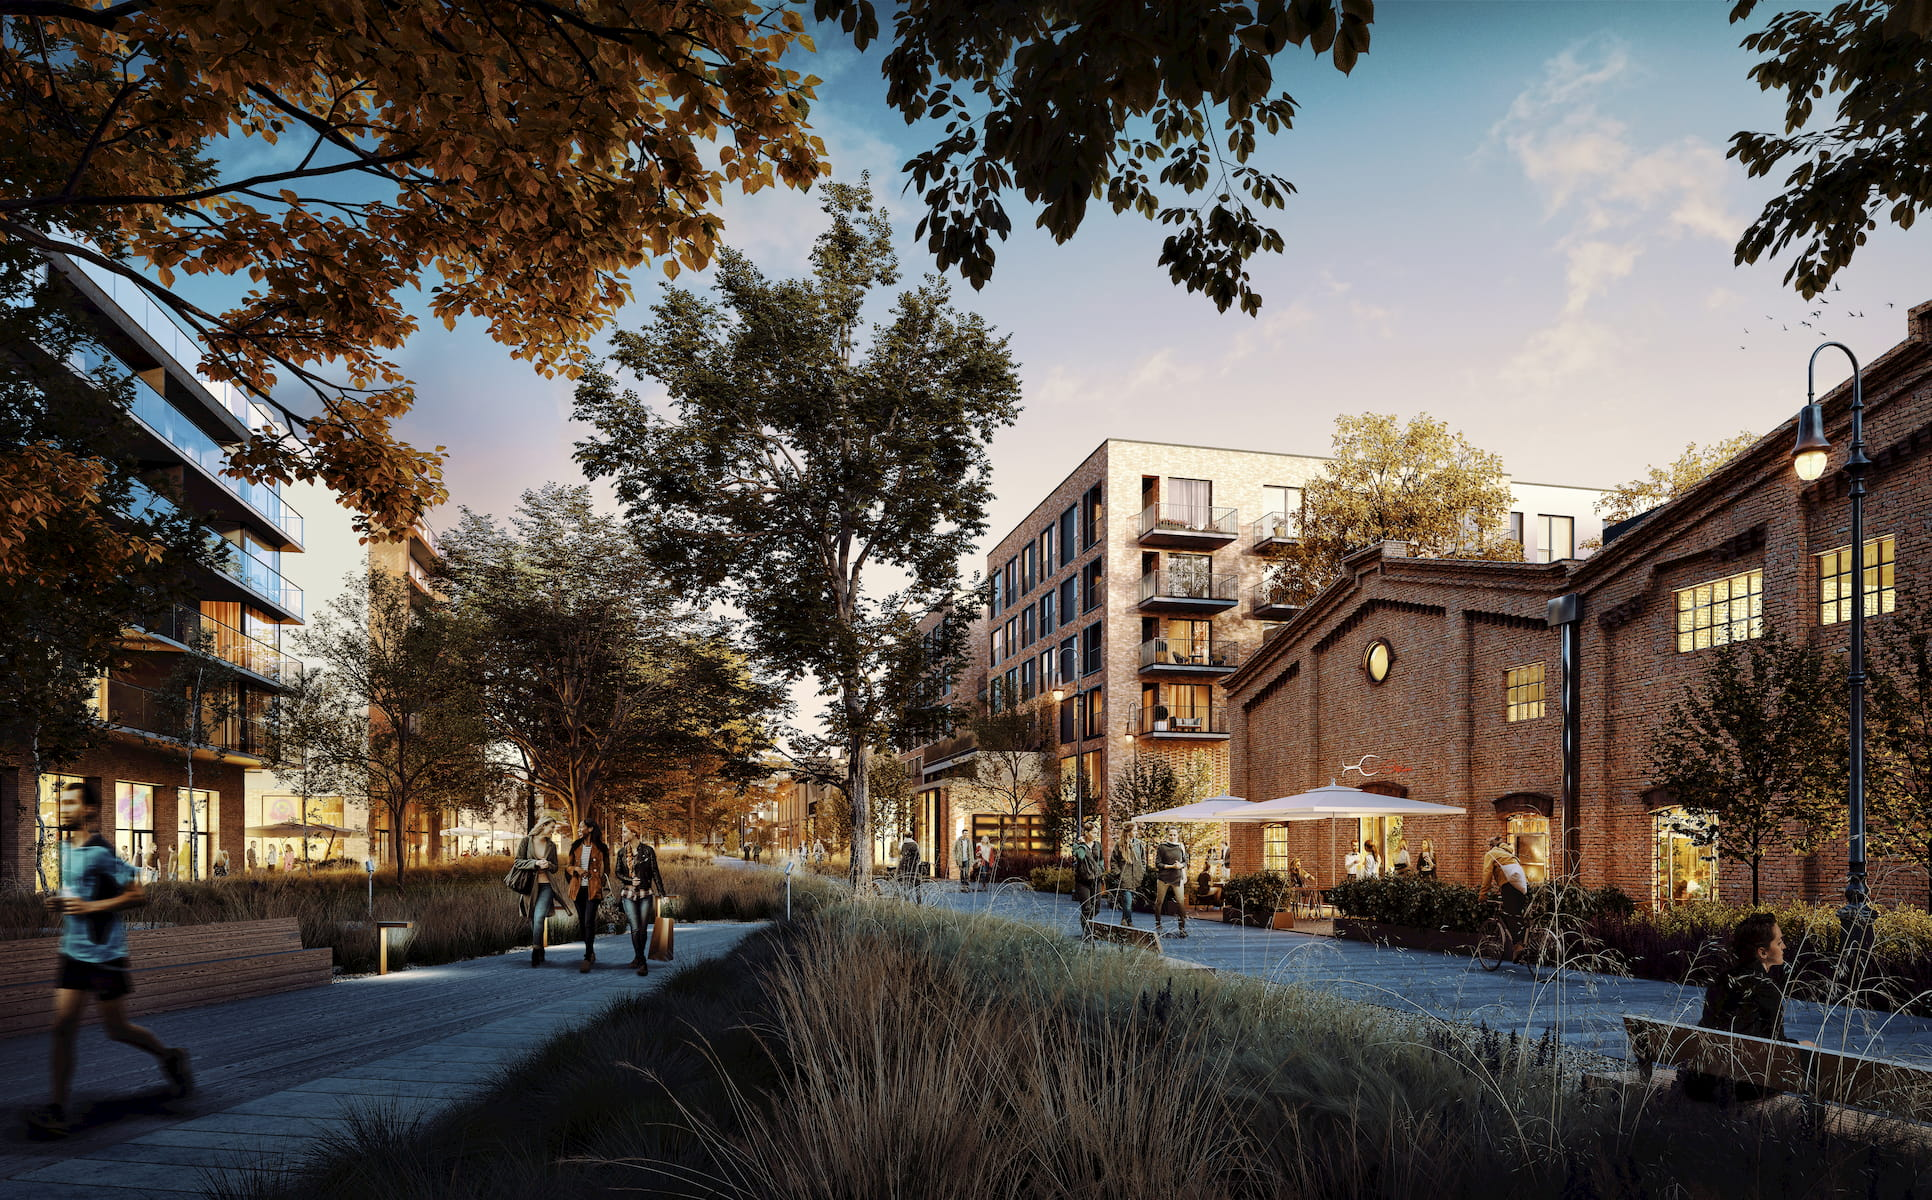 SOHO Warsaw Yareal HRA Architekci 2019 leisure area view